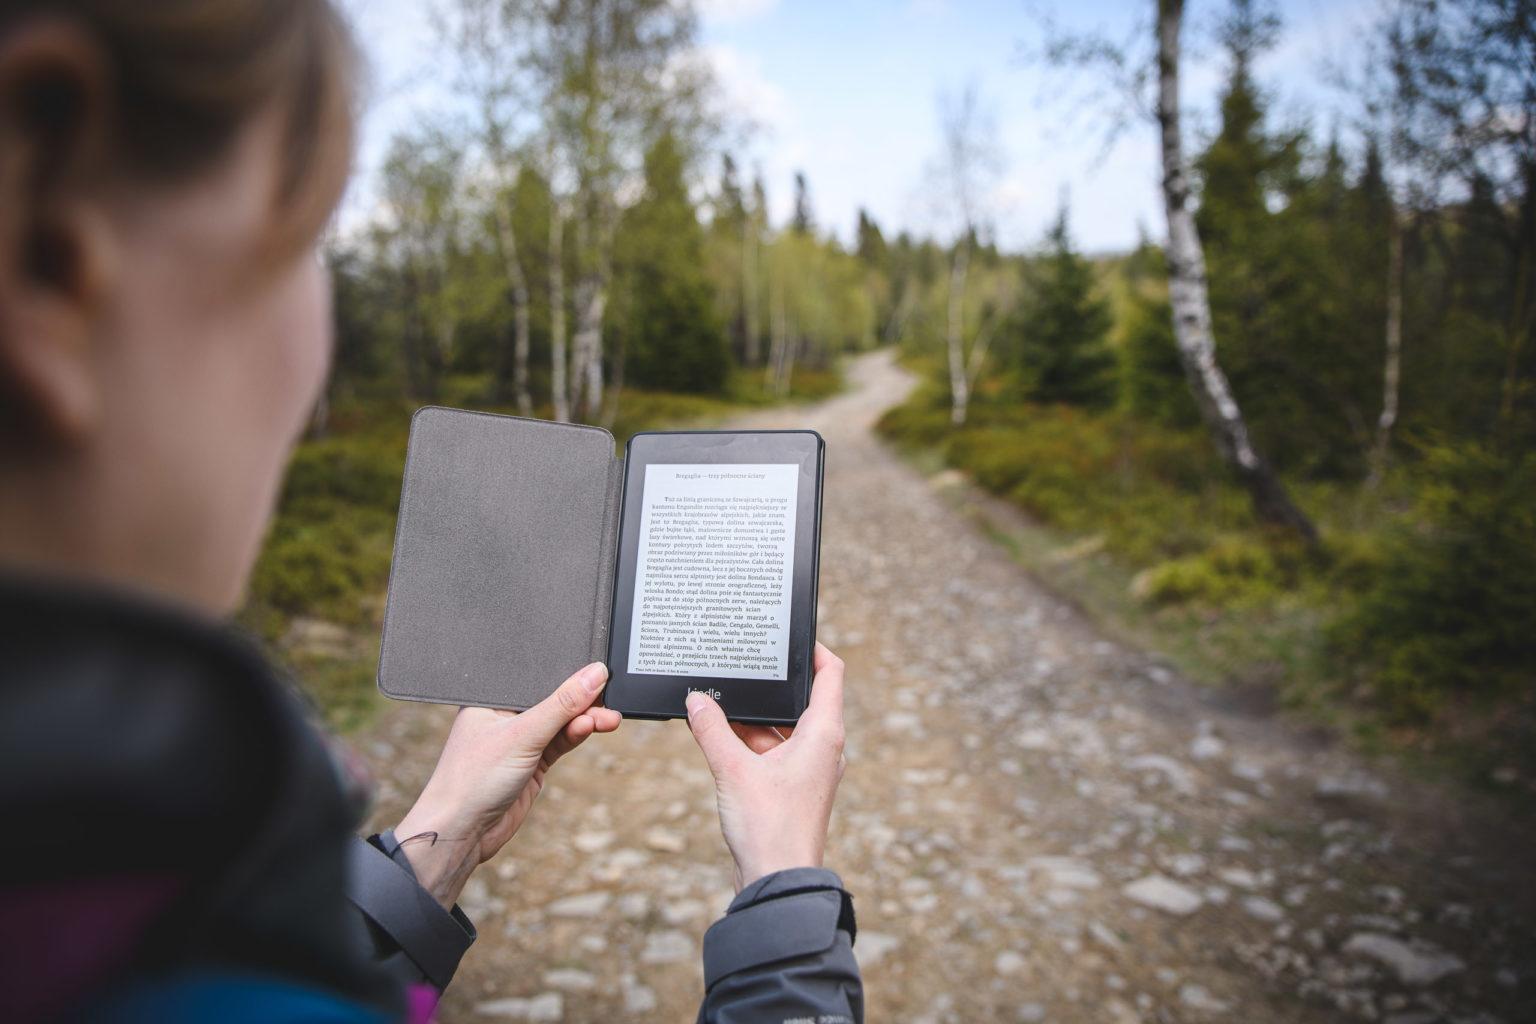 Kobieta trzyma ebooka - literatura górska